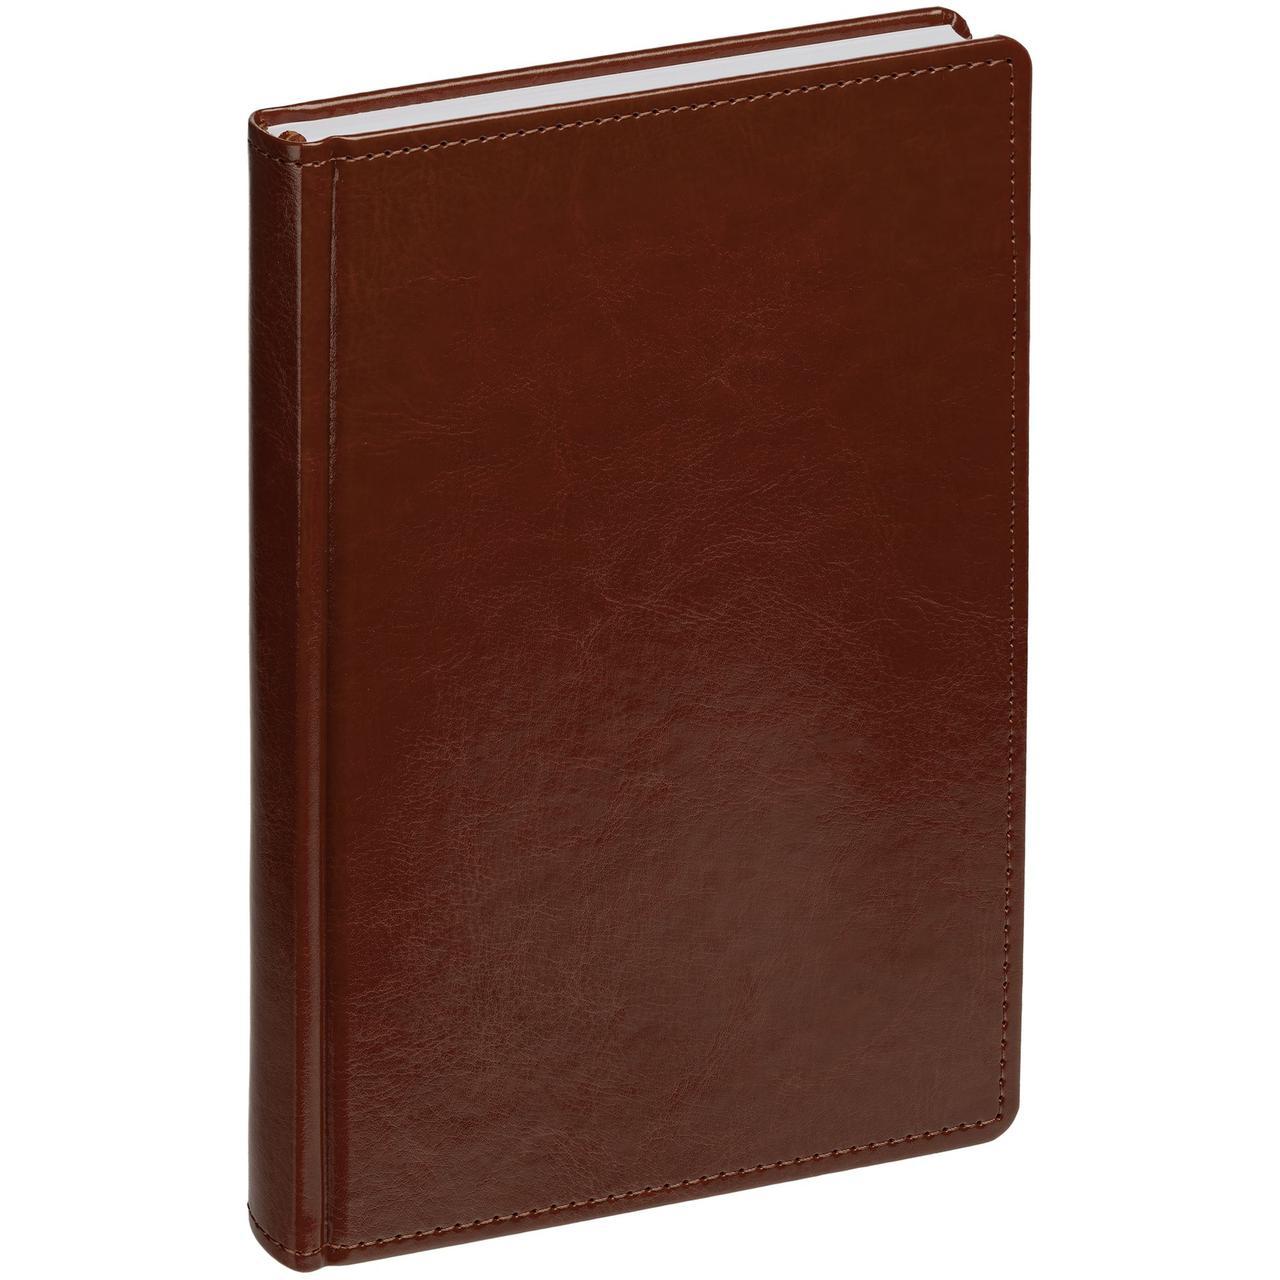 Ежедневник New Nebraska, датированный, коричневый (артикул 12878.55)